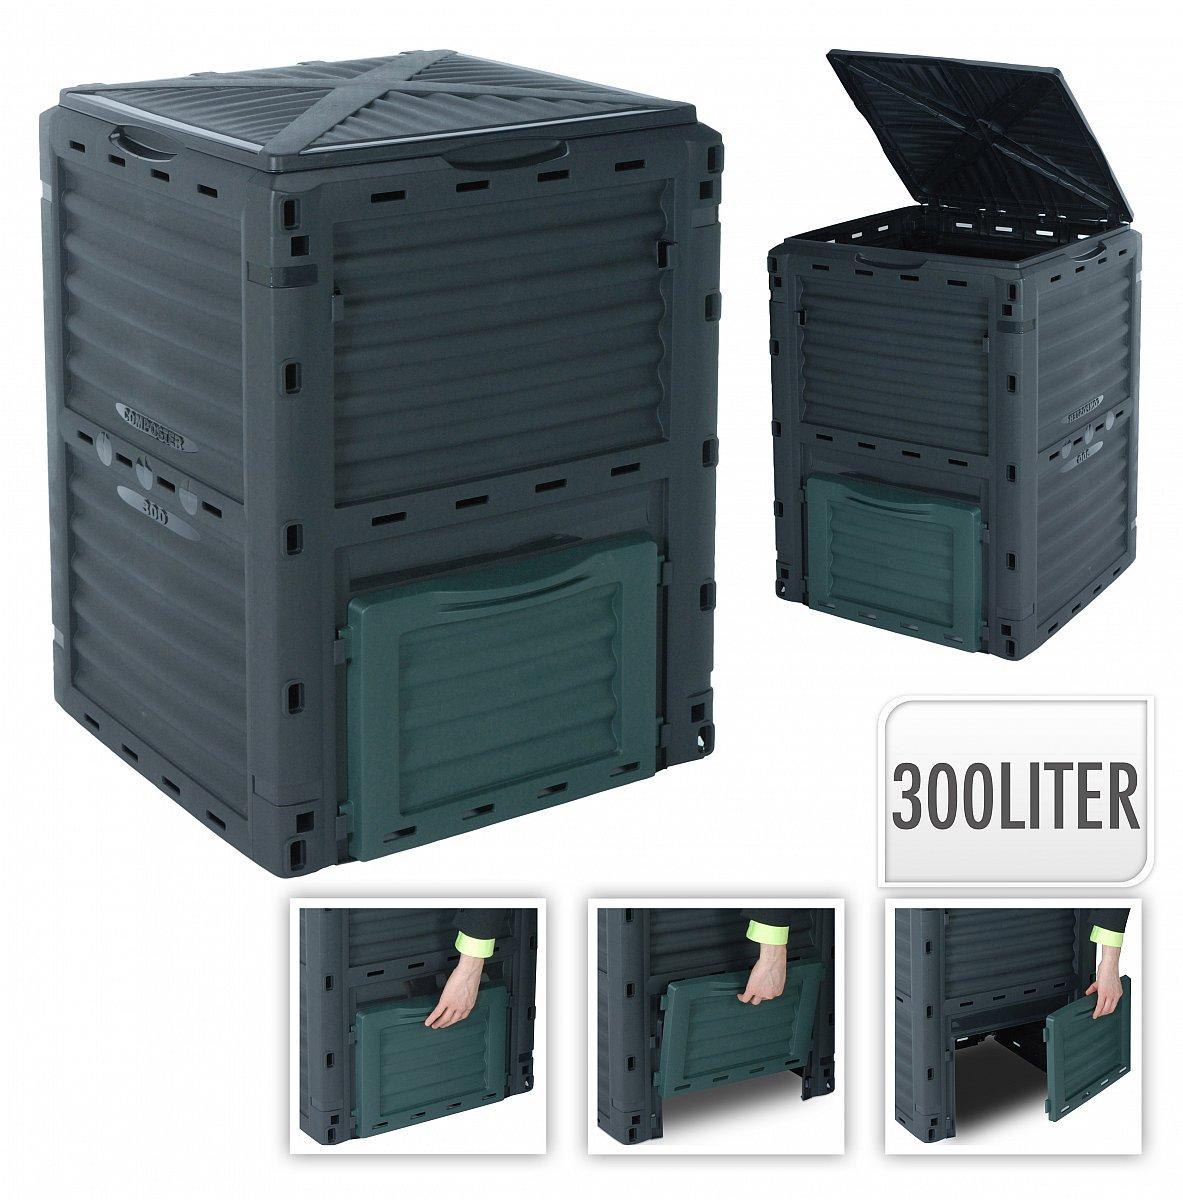 komposter thermokomposter schnellkomposter gartenkomposter 300 ltr y860 ebay. Black Bedroom Furniture Sets. Home Design Ideas